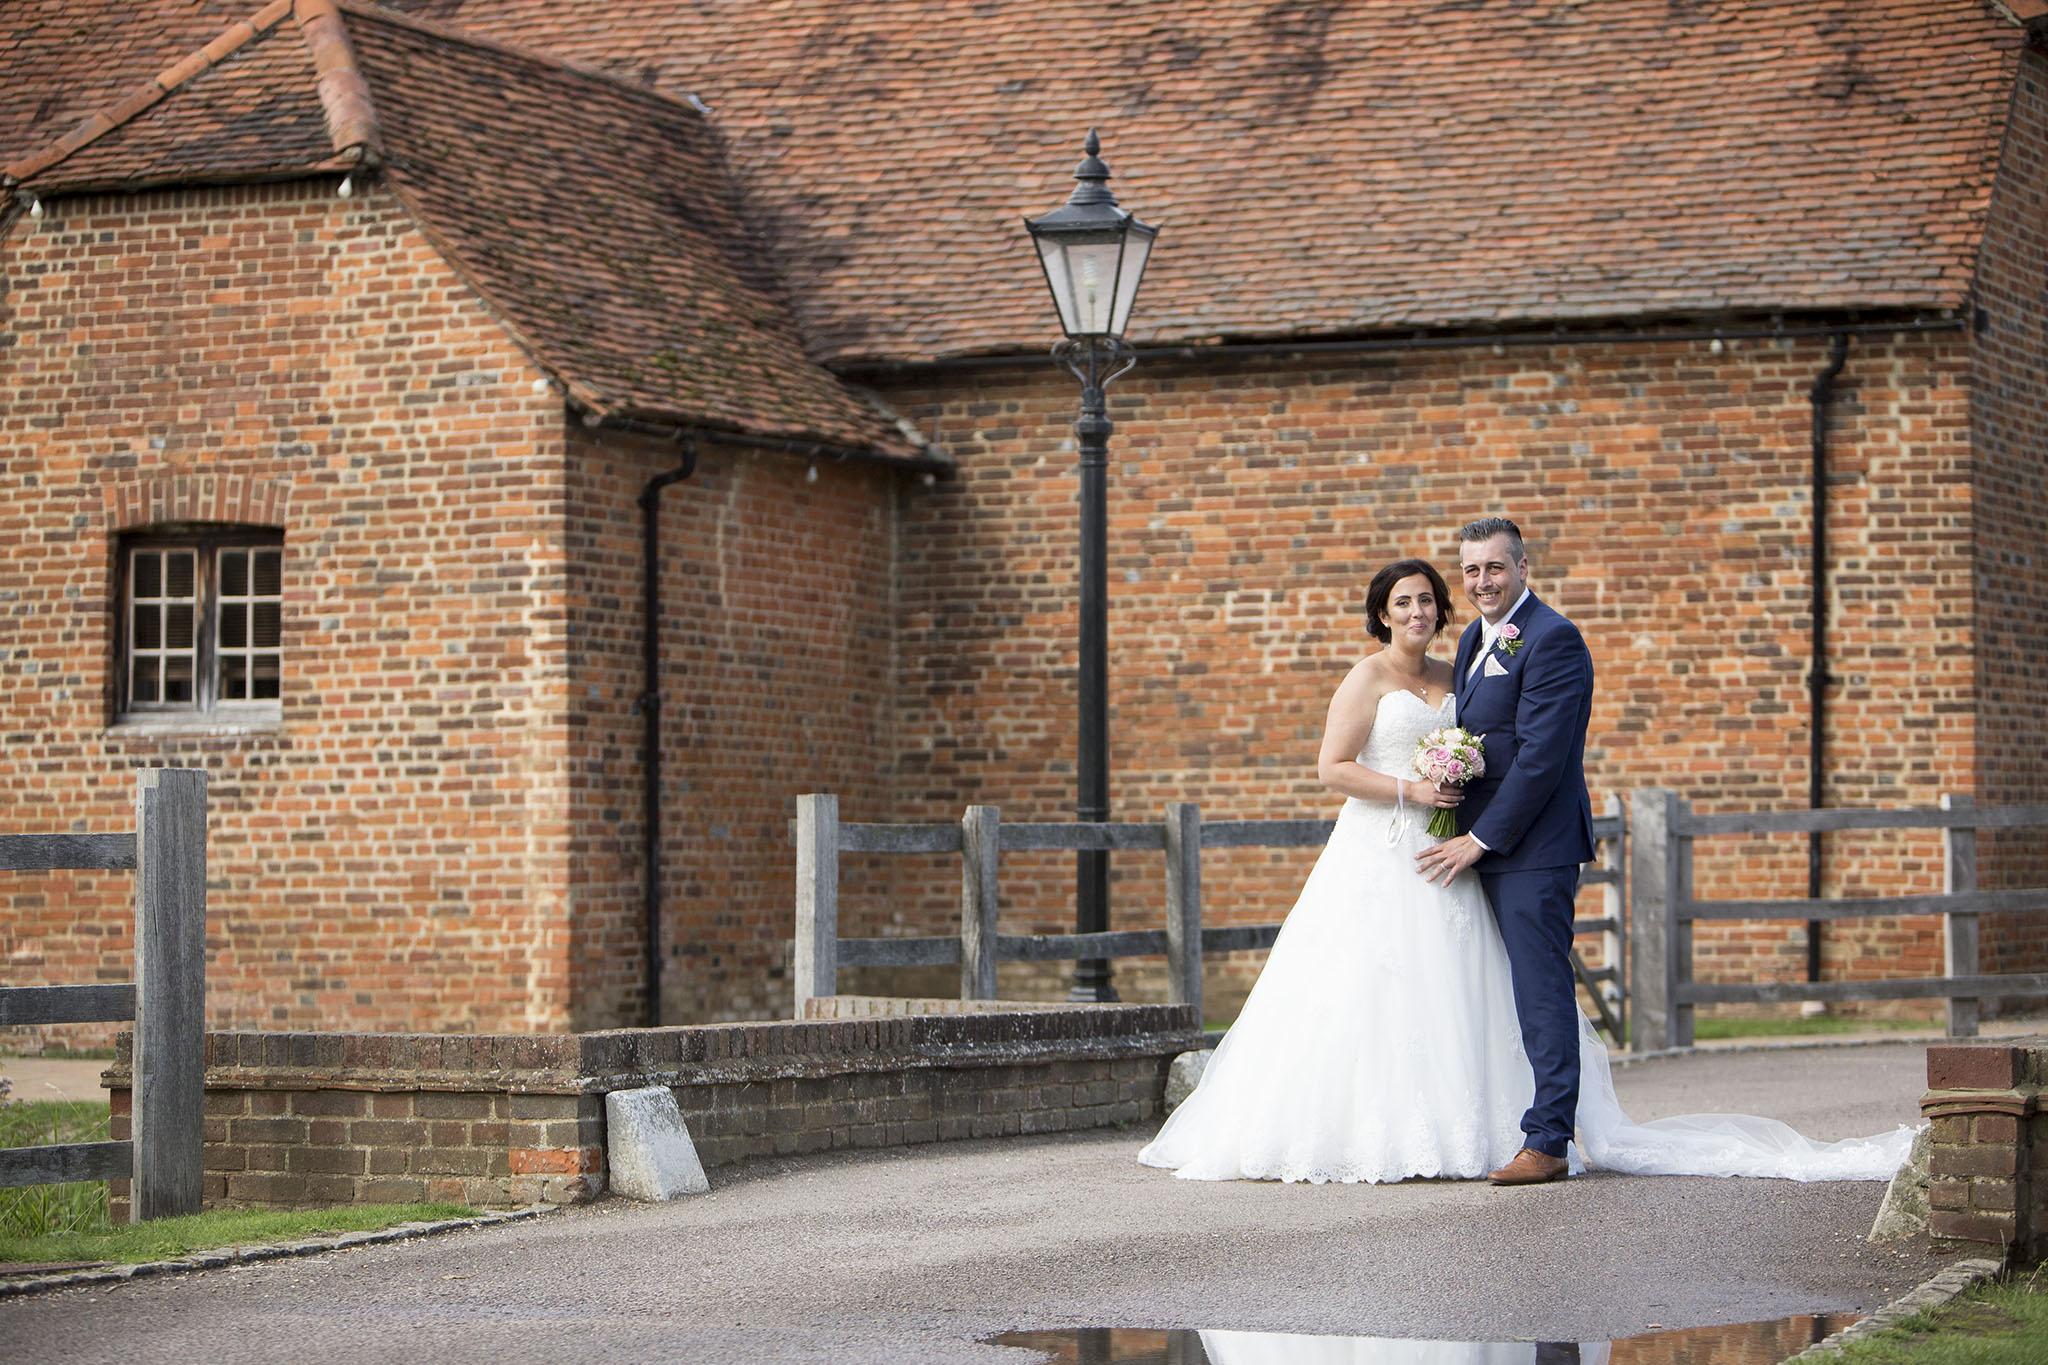 elizabethgphotography_kingslangley_hertfordshire_fineart_wedding_tewinbury_farm_tayna_27.jpg